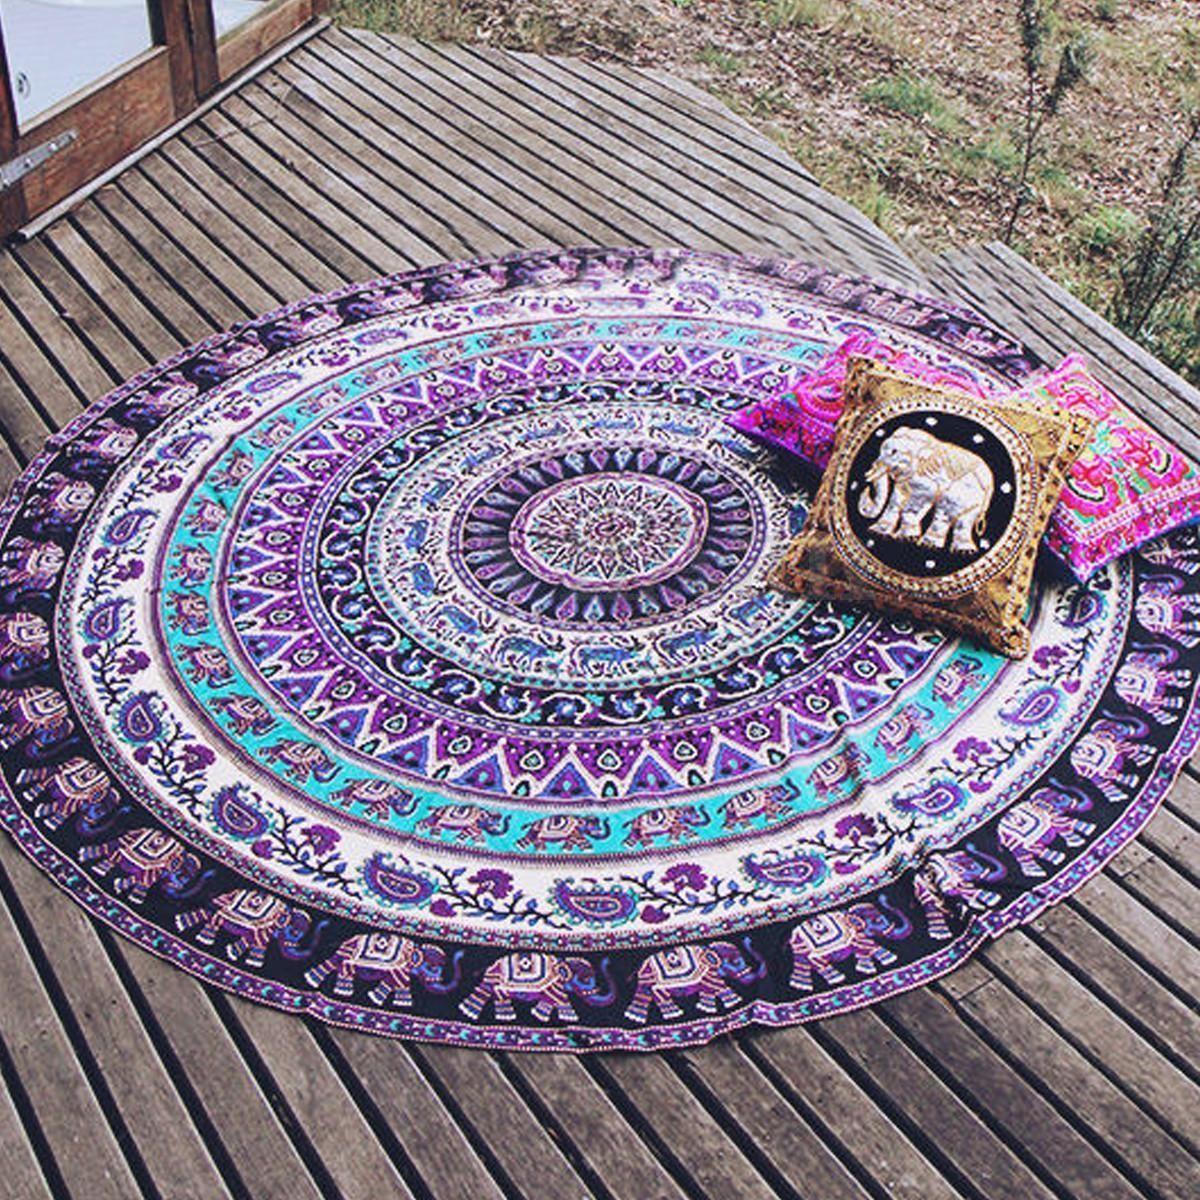 Bohemian Mandala Round Beach Tapestry Hippie Throw Yoga Mat Rug Blanket Decor